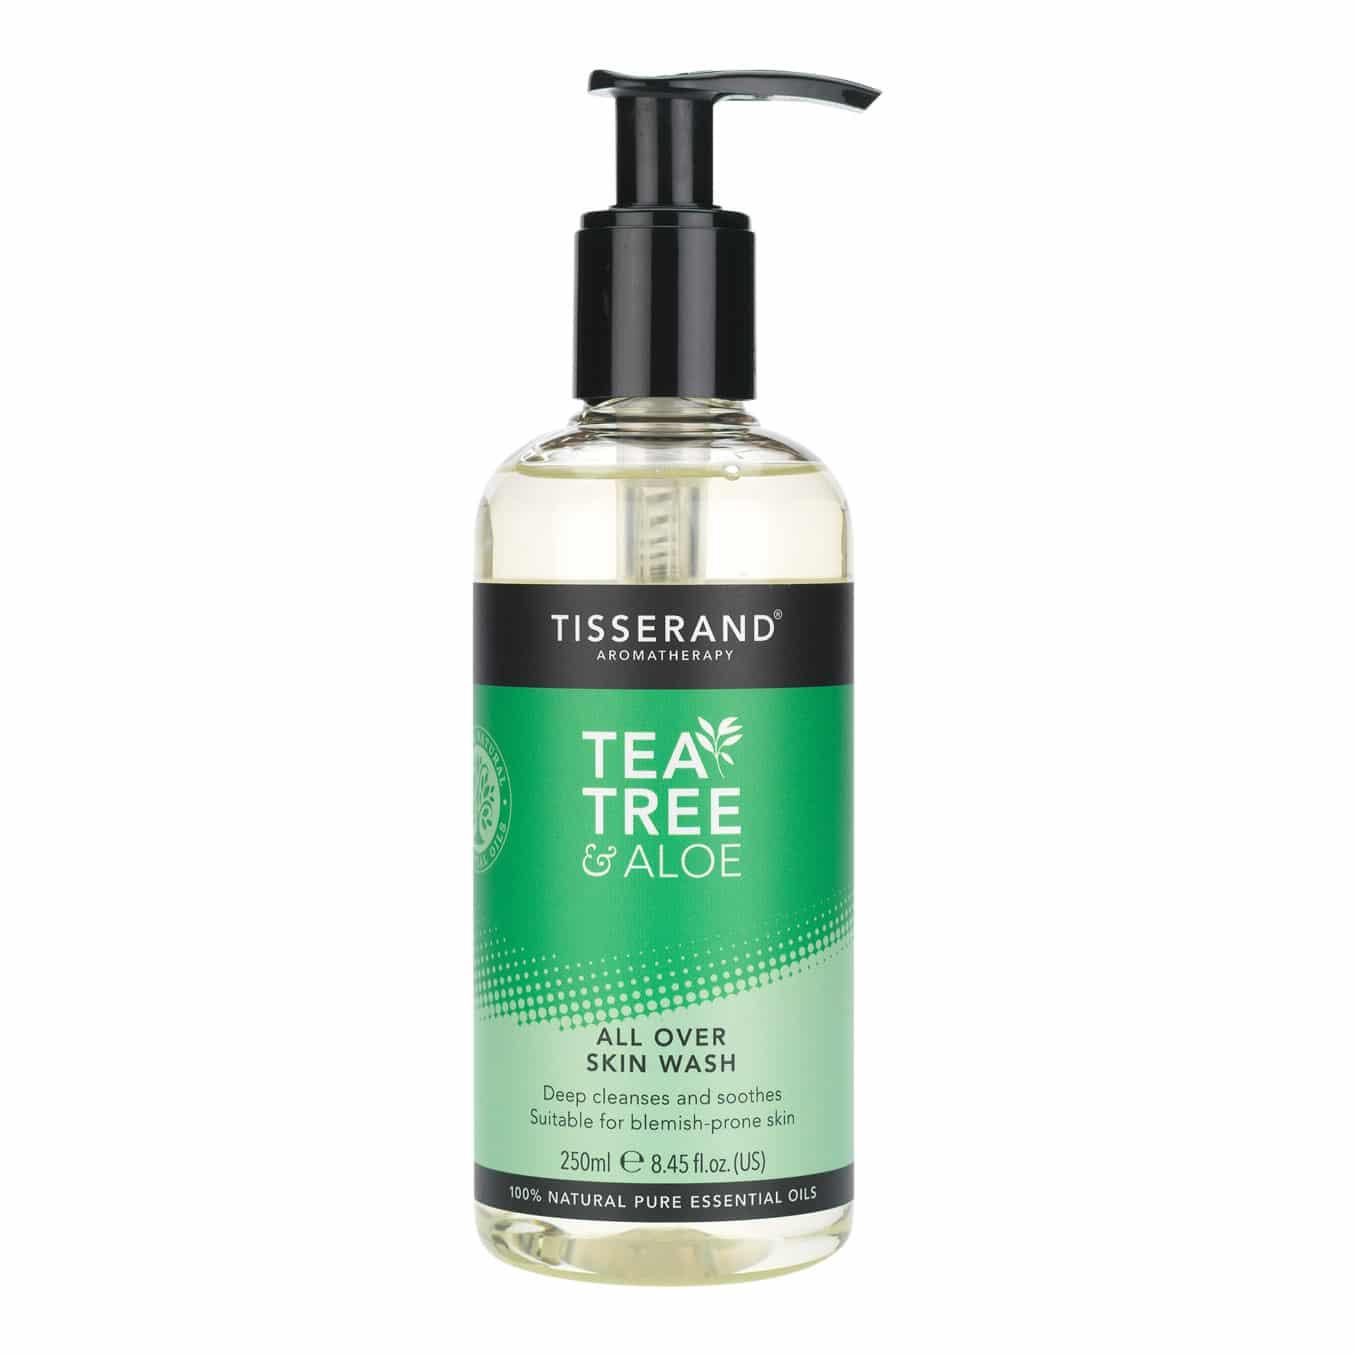 Tisserand Tea Tree Skin Wash